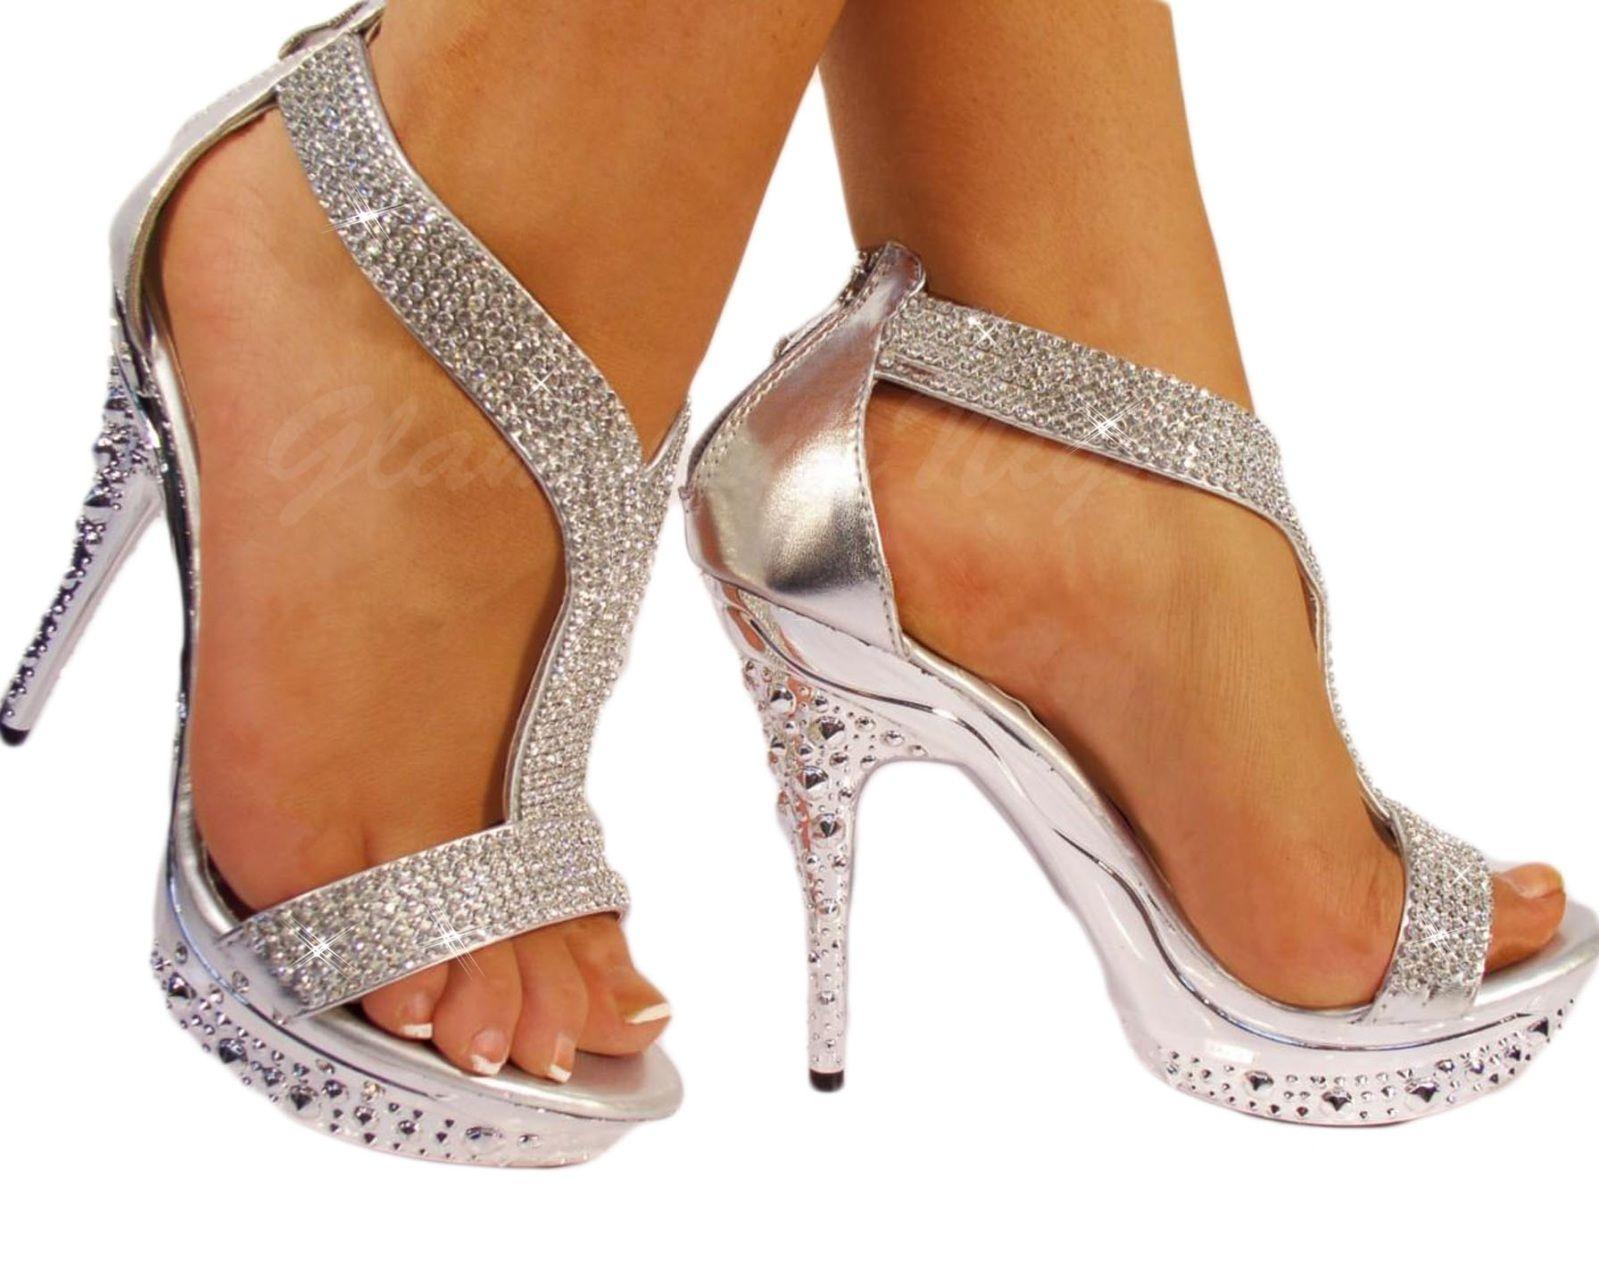 Silver diamante encrusted sandal, high heel, platform ...